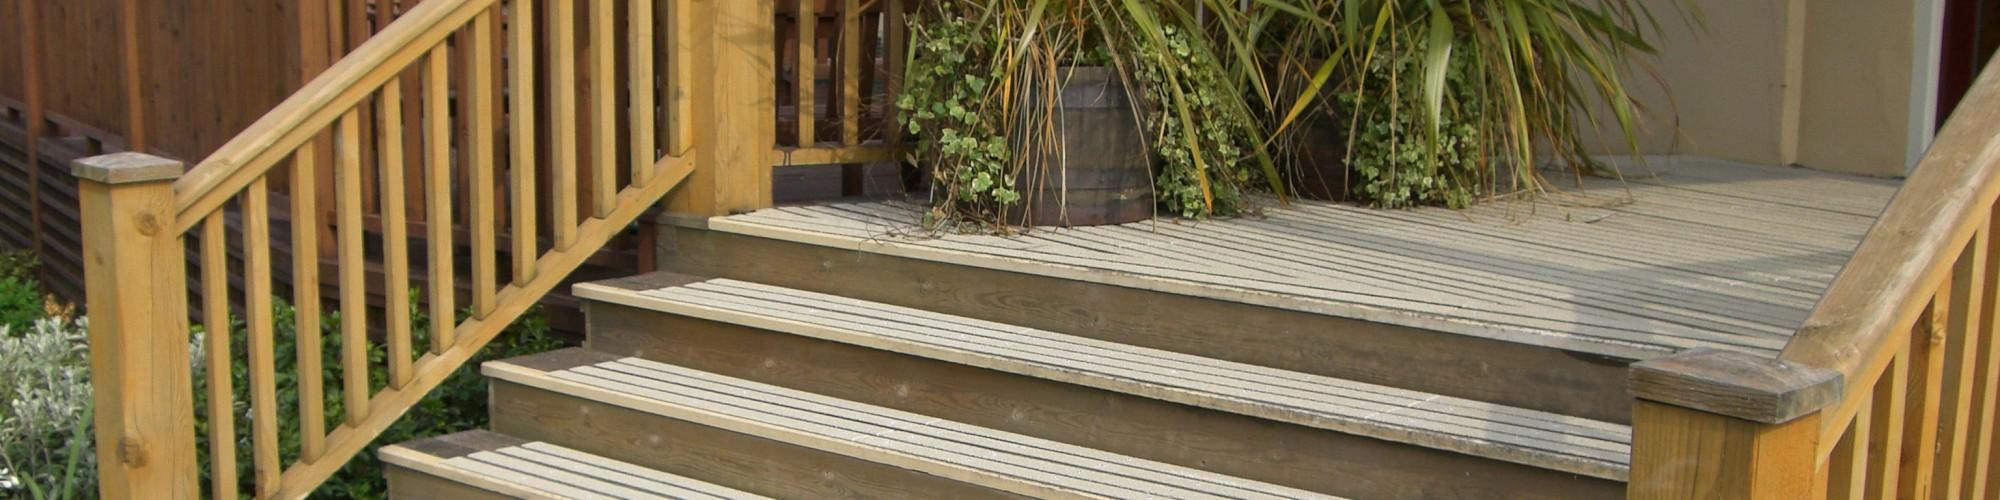 Anti-slip Decking Solutions